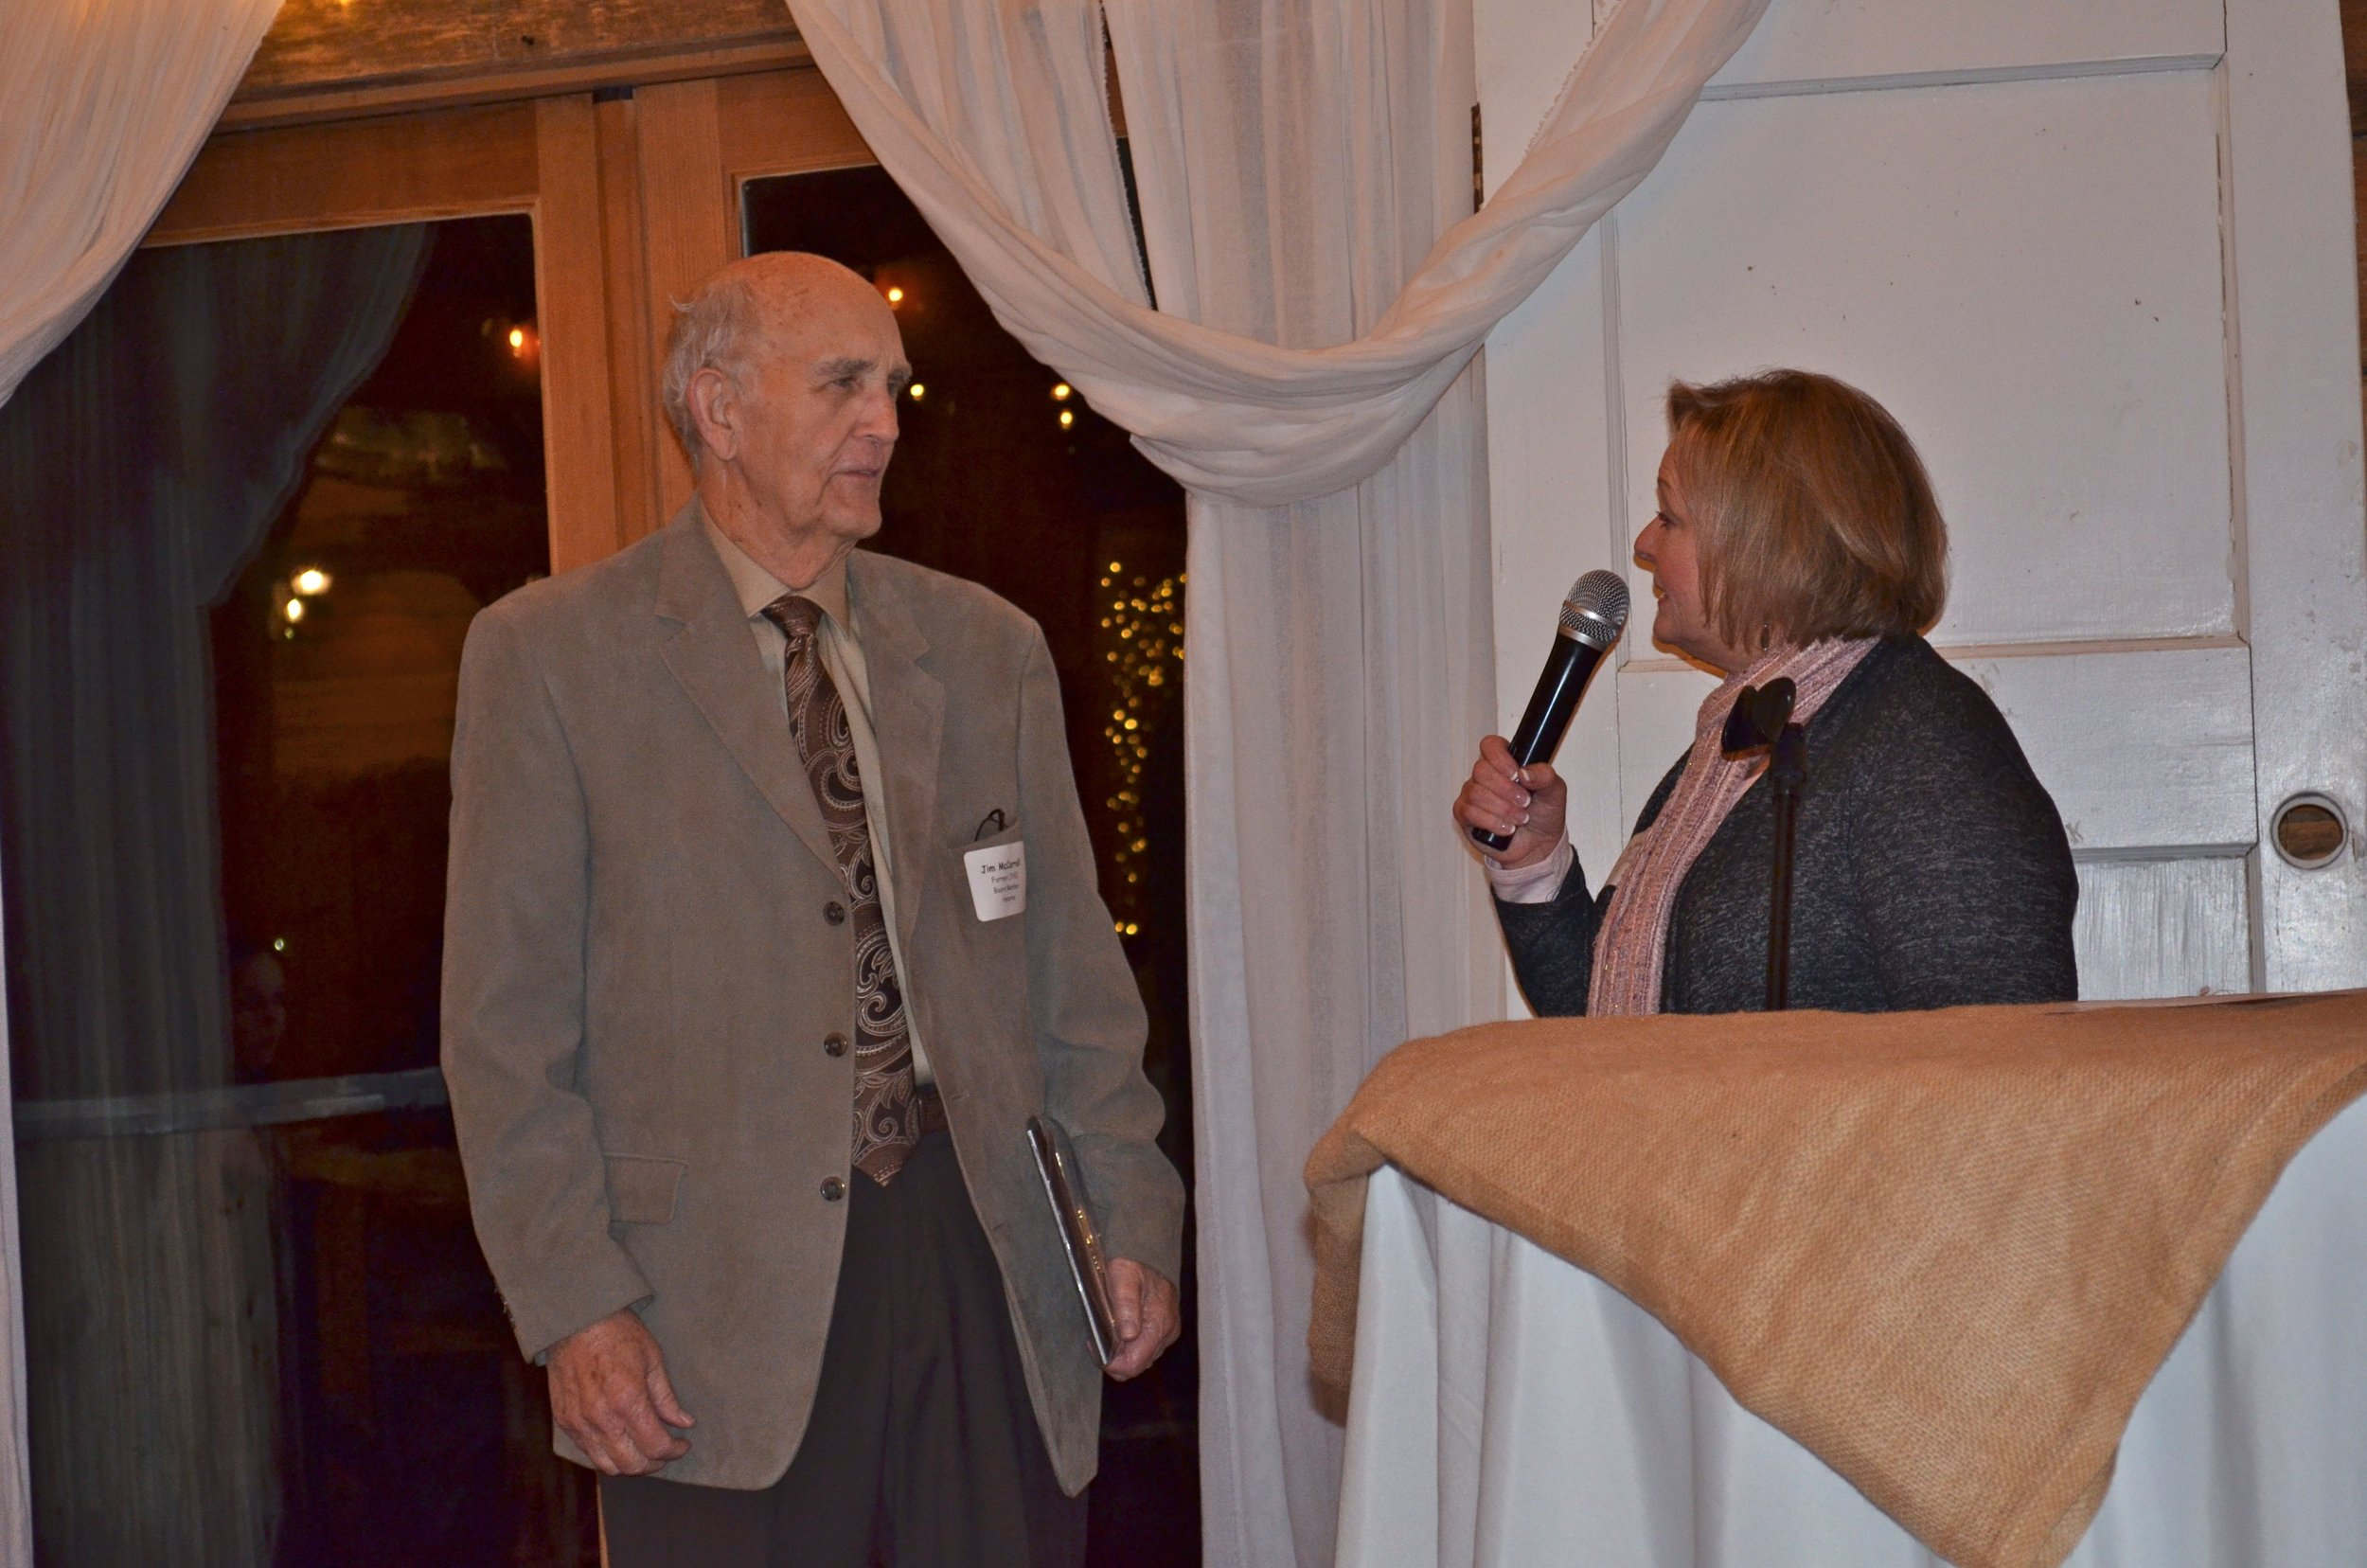 Jim McCarroll and Pam Potocik